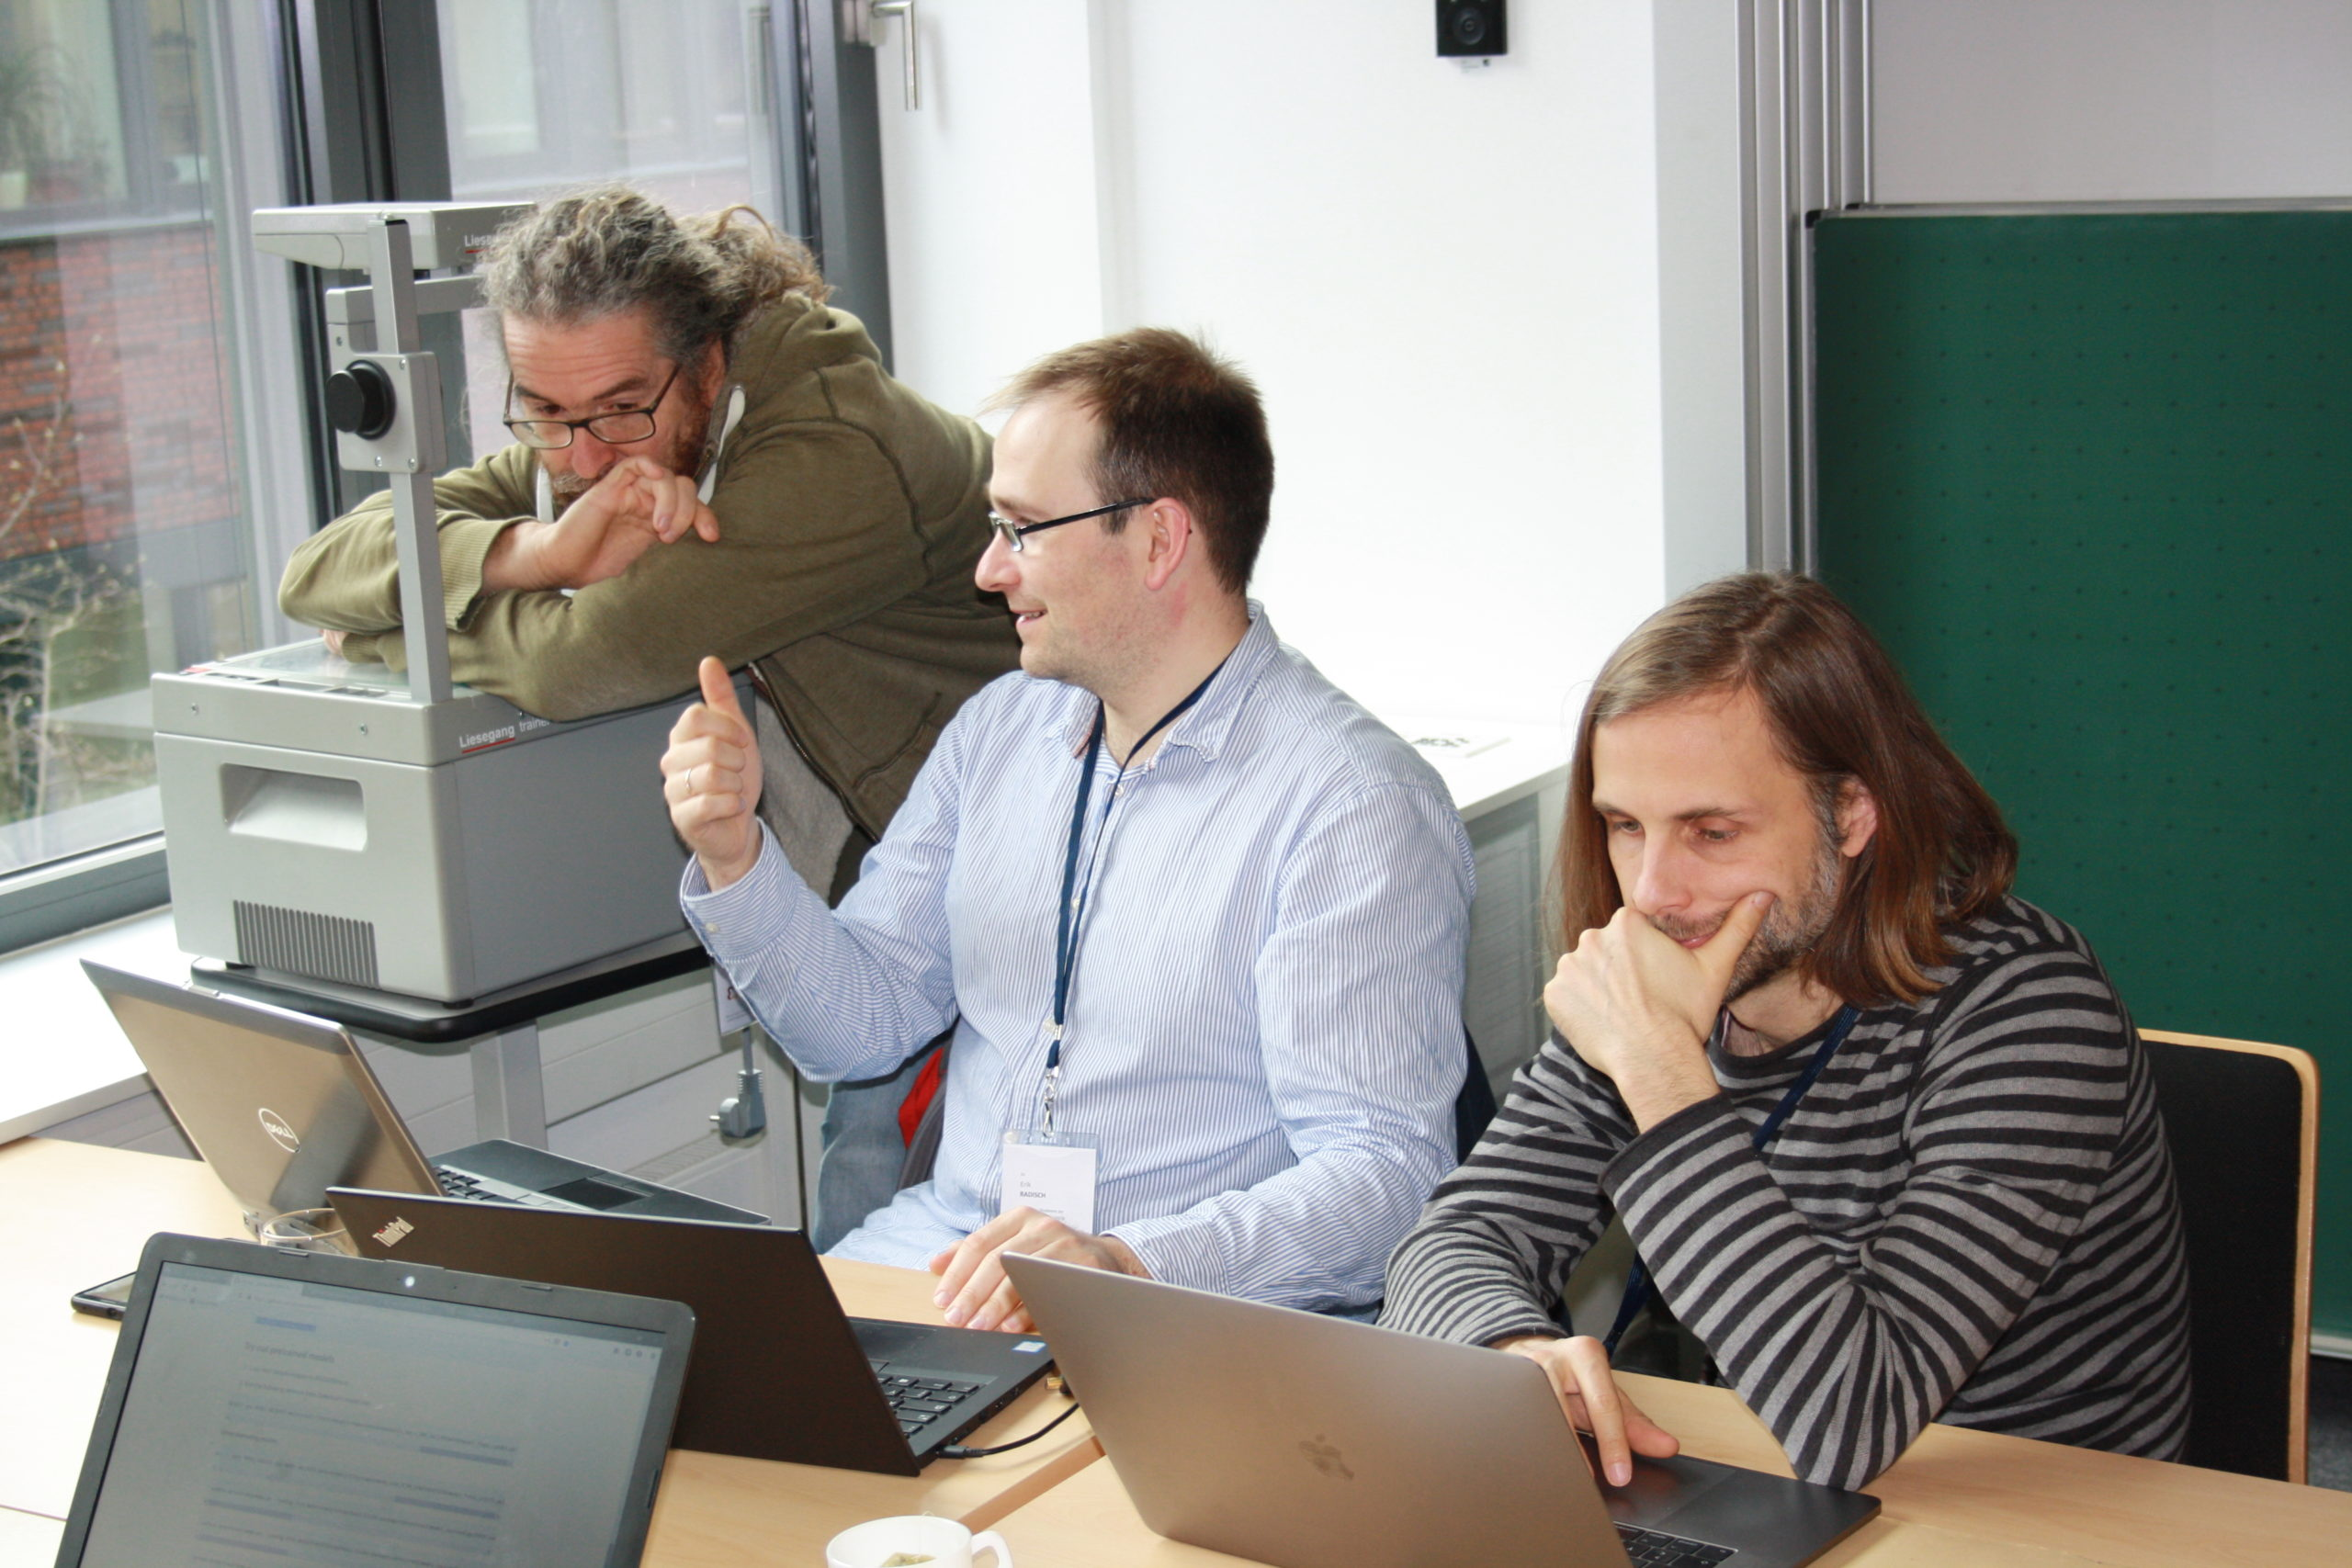 Foto: Markus Freudinger/Universität Paderborn, CC BY 3.0 DE